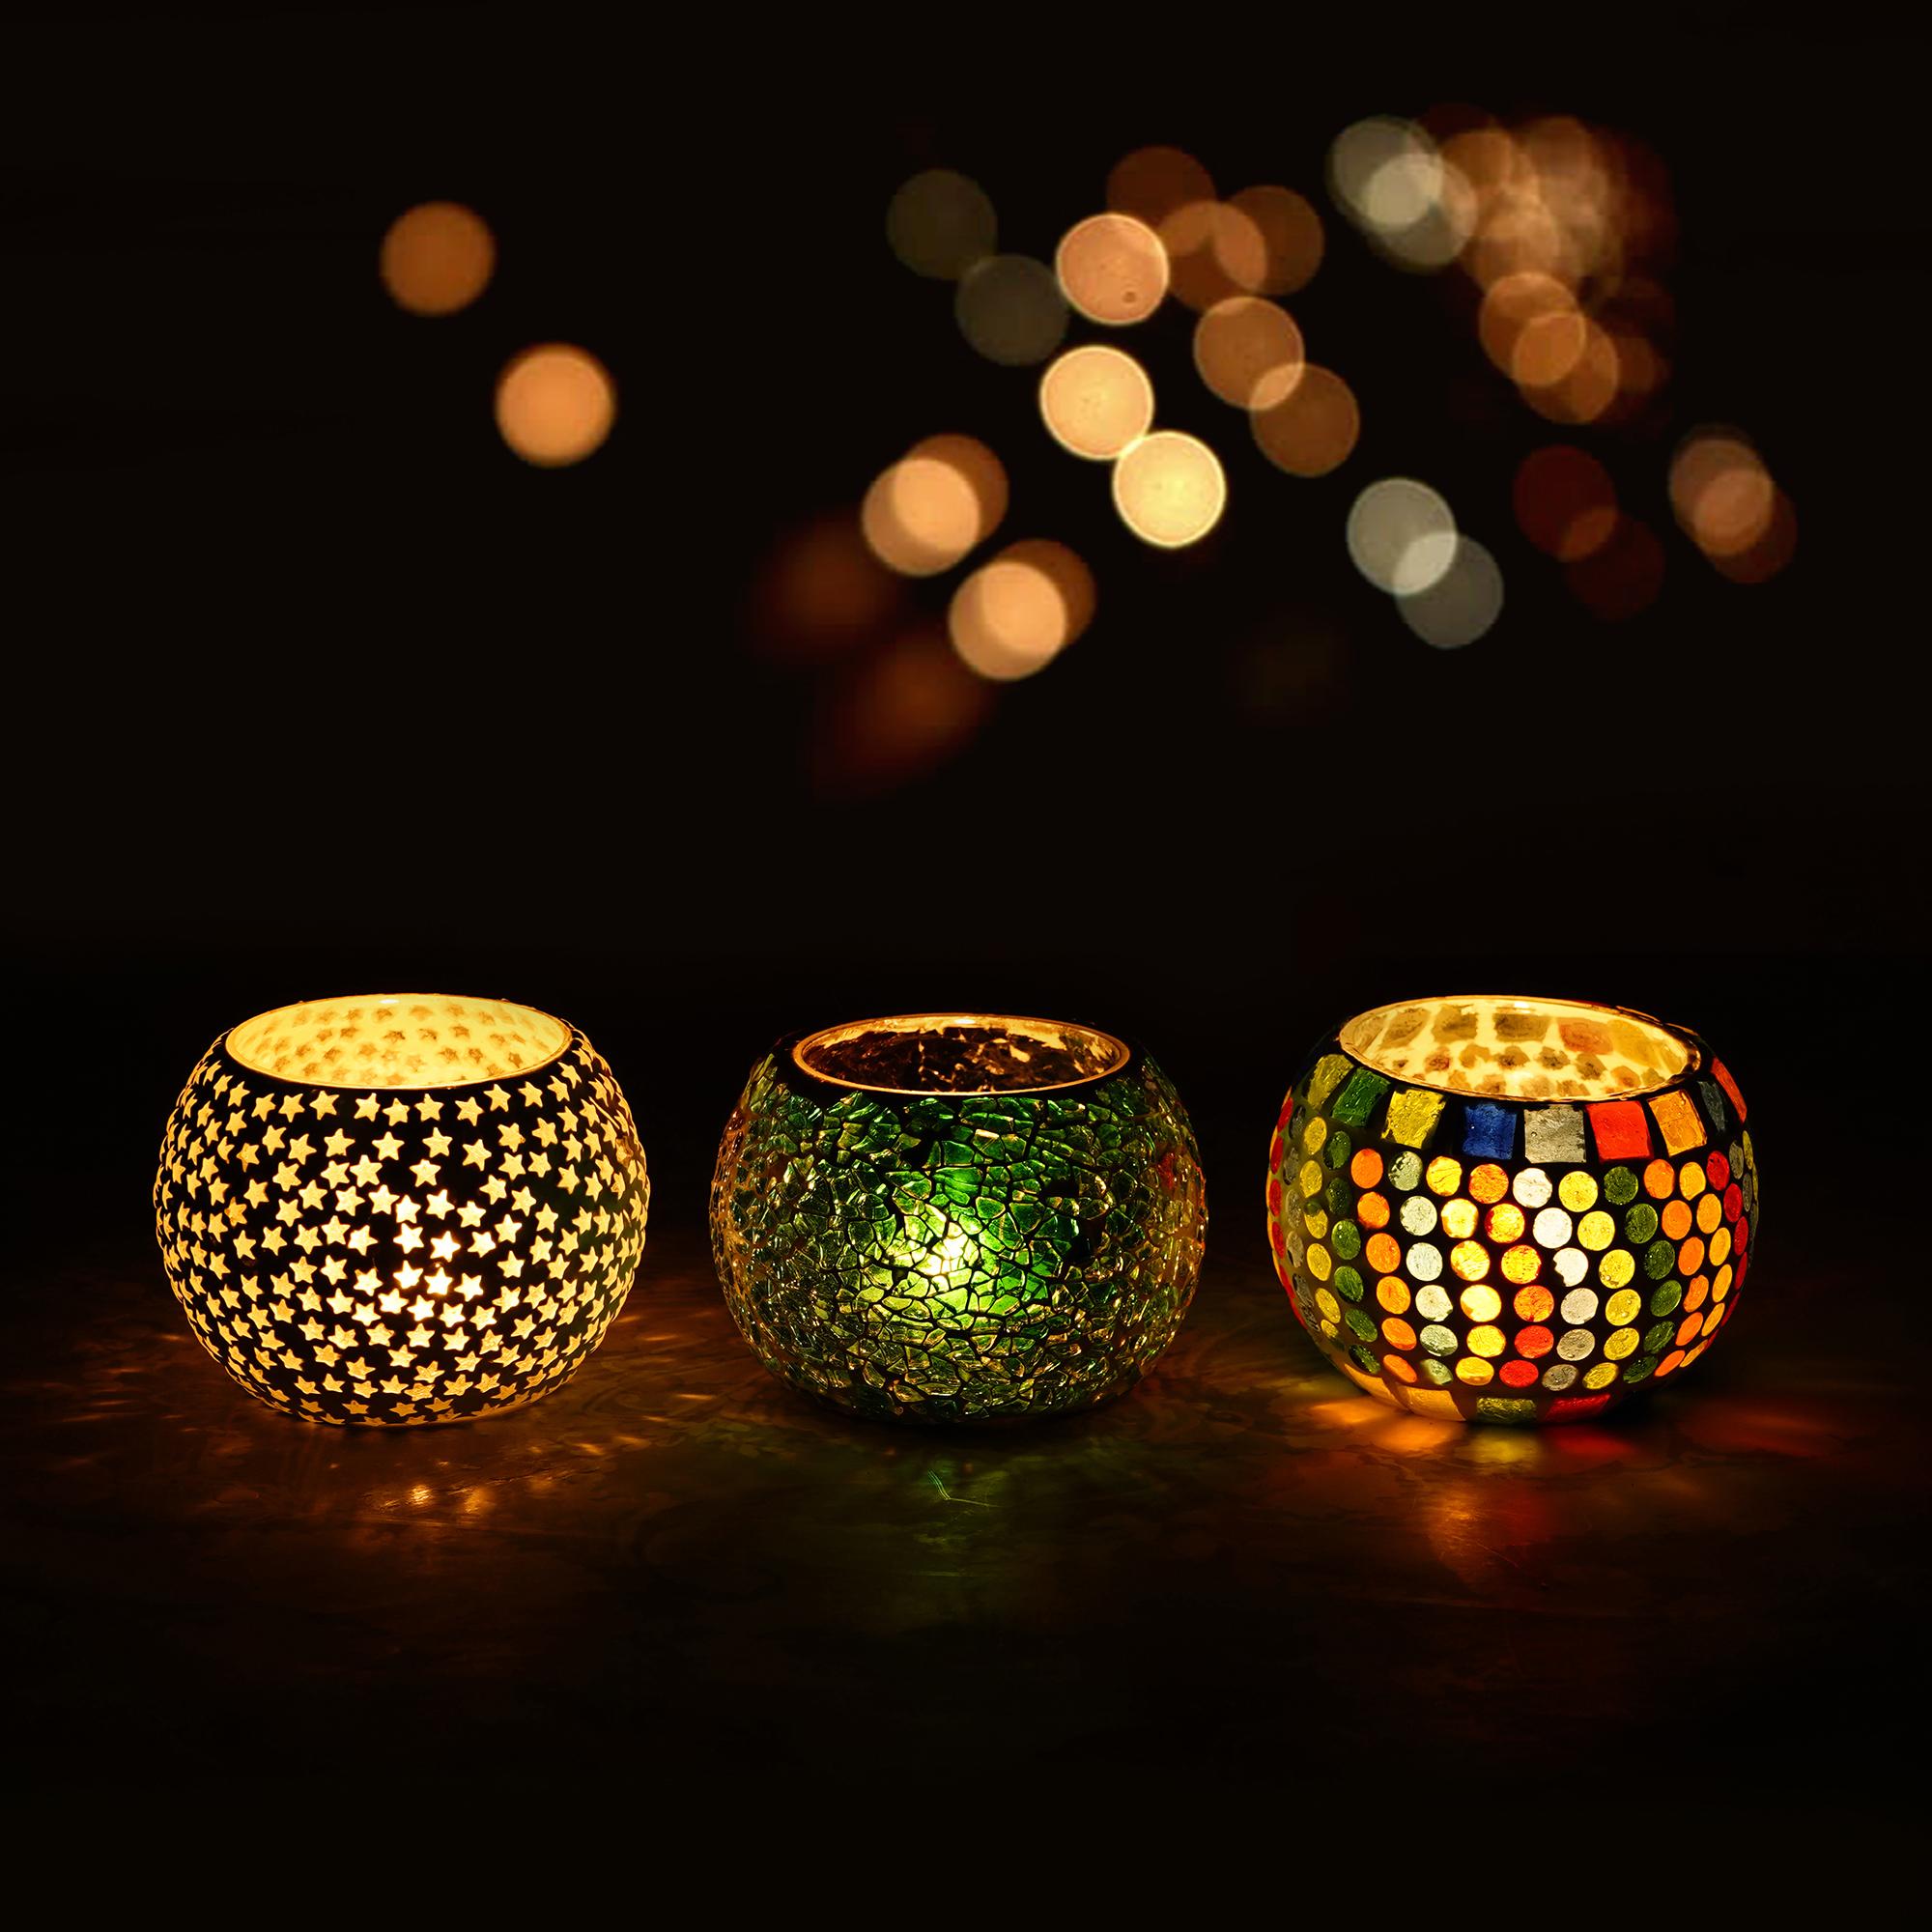 Set of 3 Mosiac Glass Decorative Tea Light Holder/Diya Indian Home Decor